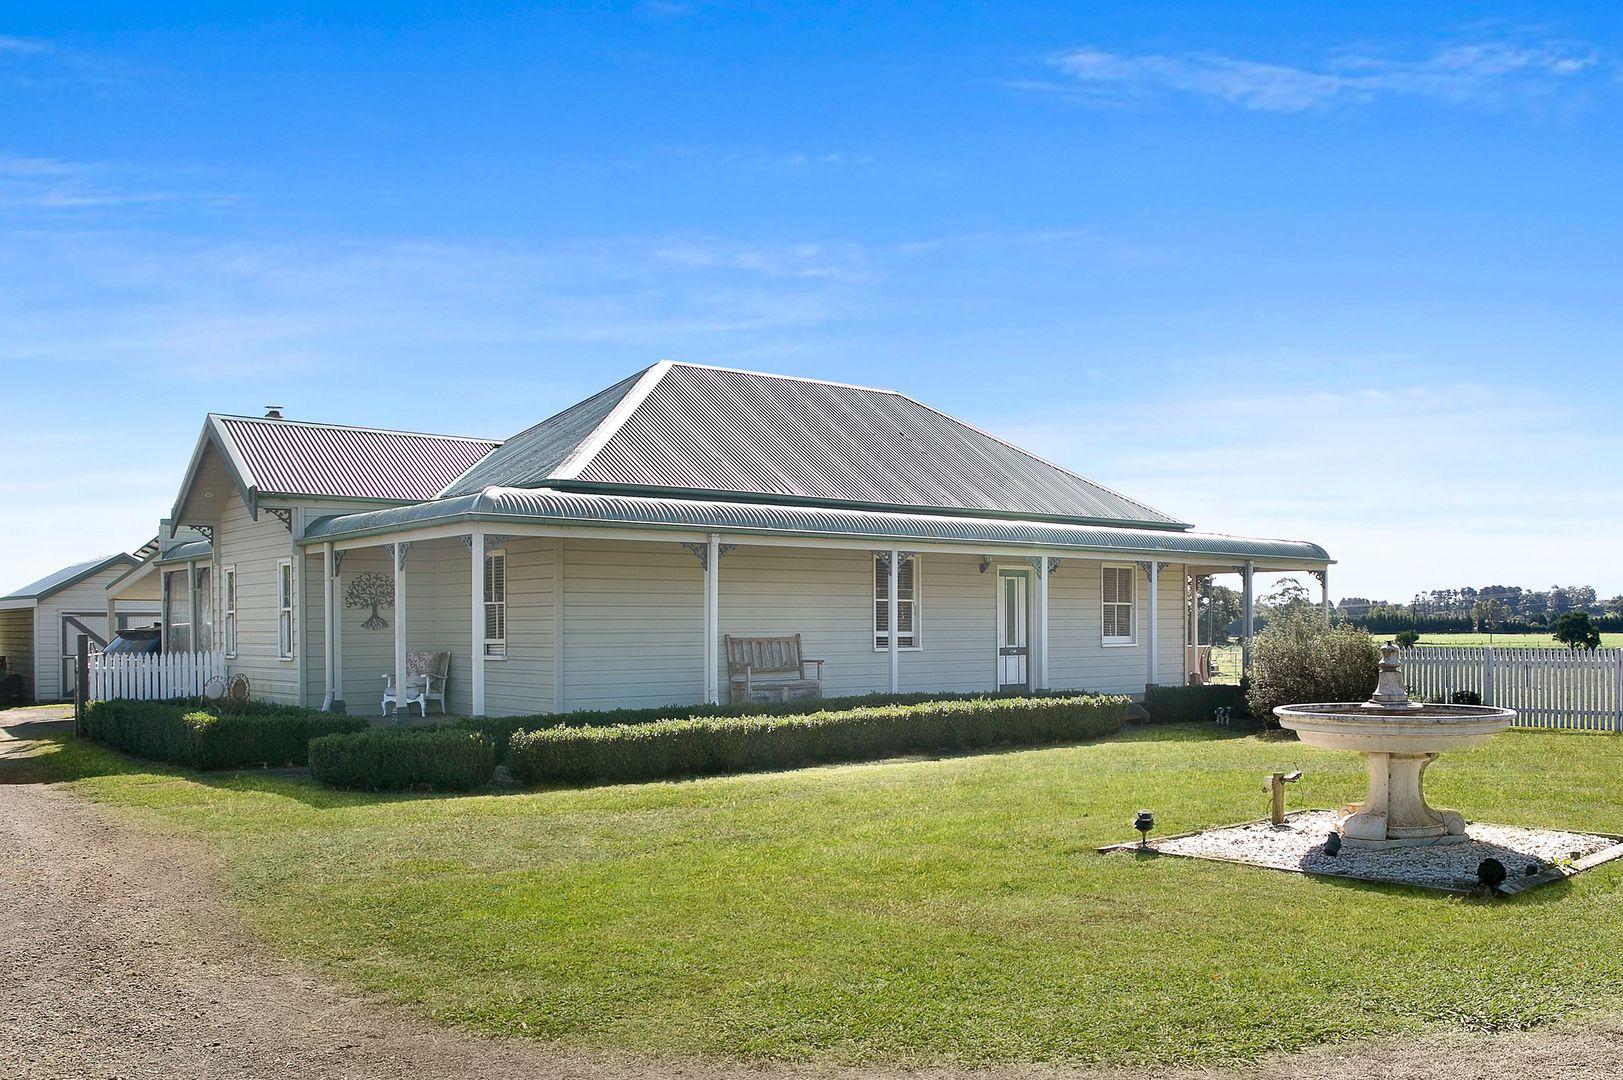 Lot 6, 662 Sheepwash Road, Avoca NSW 2577, Image 0